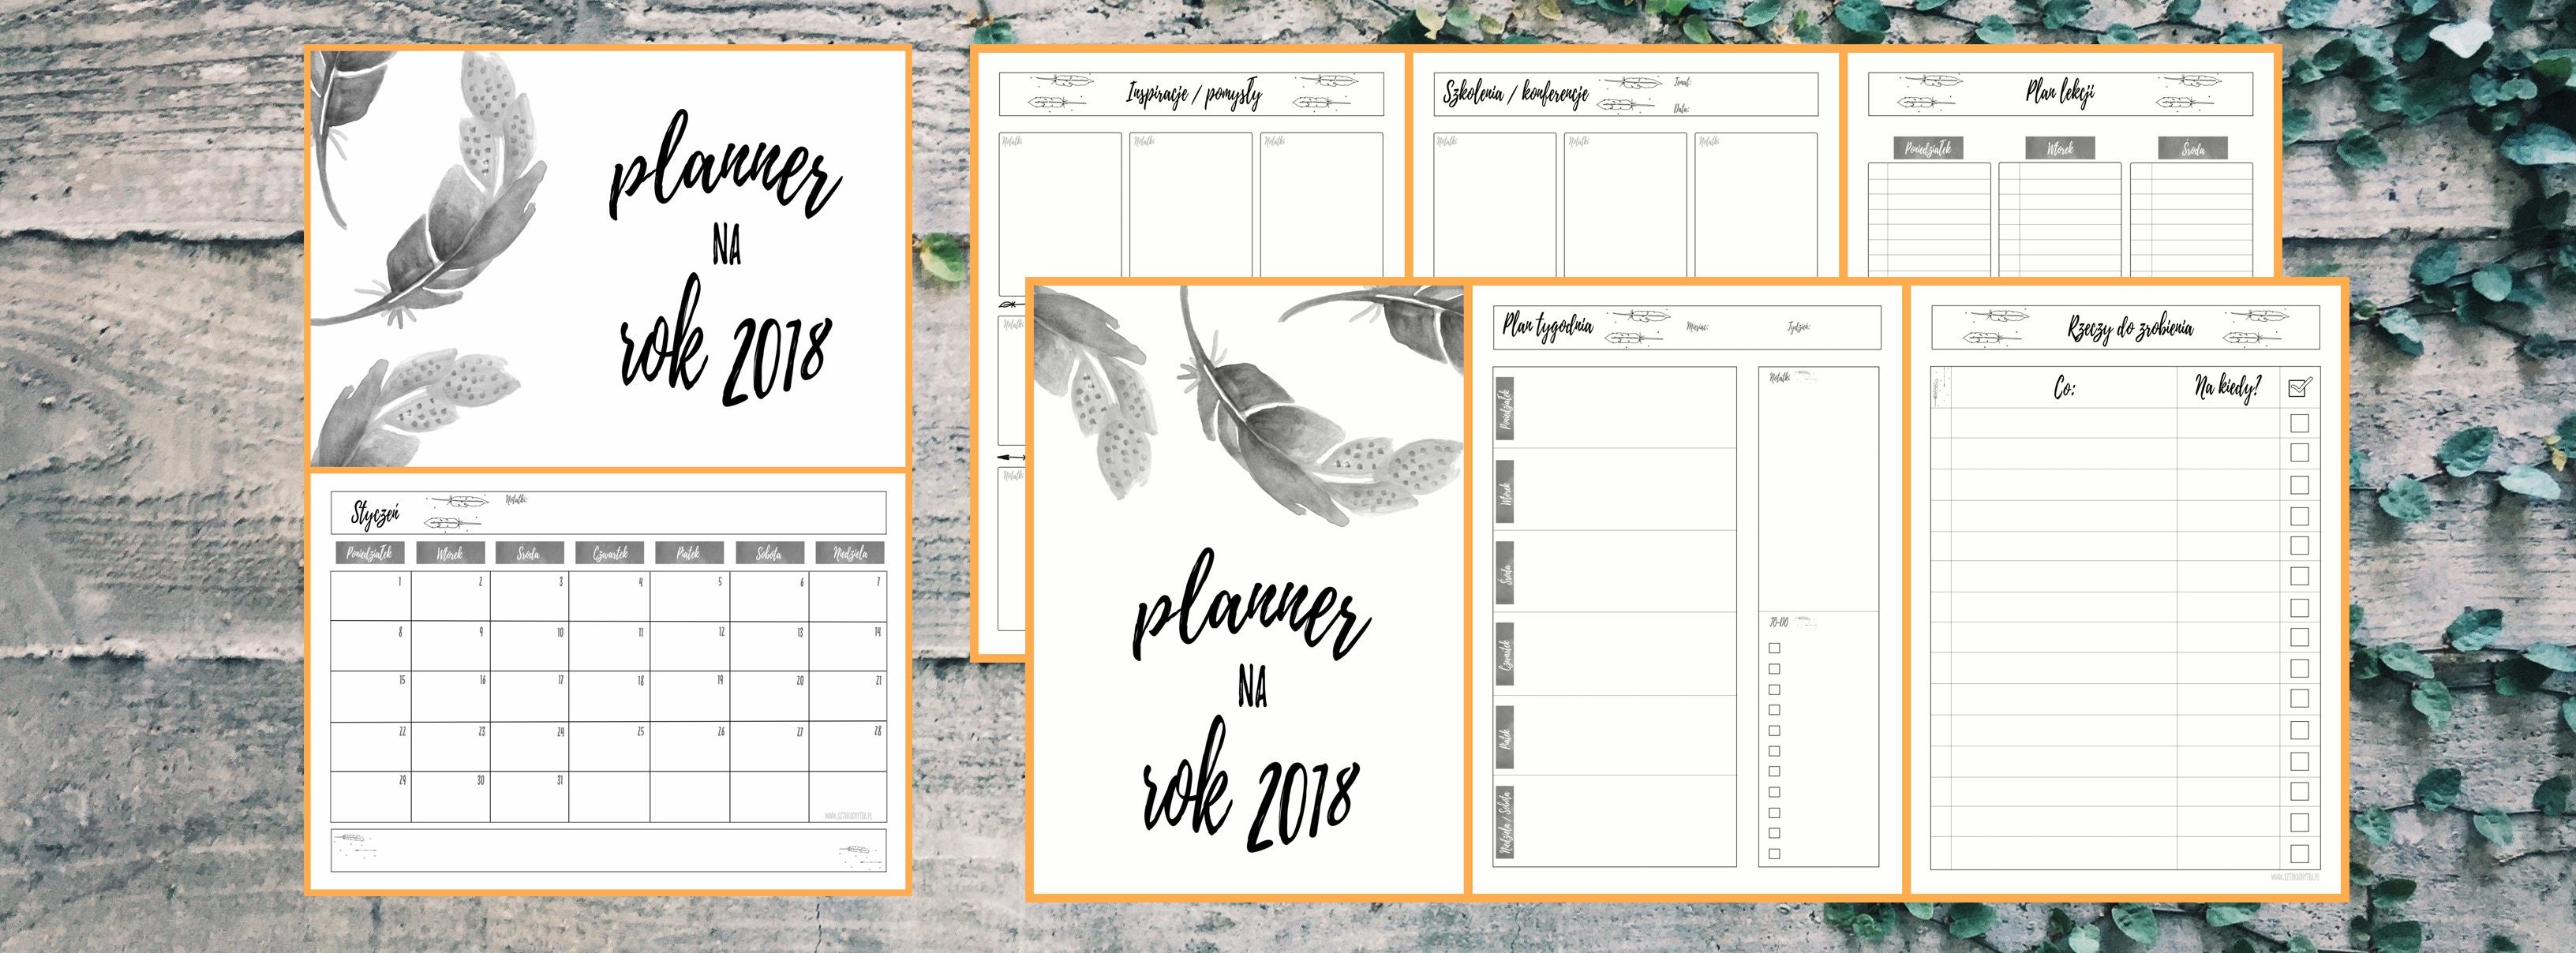 planner-2018